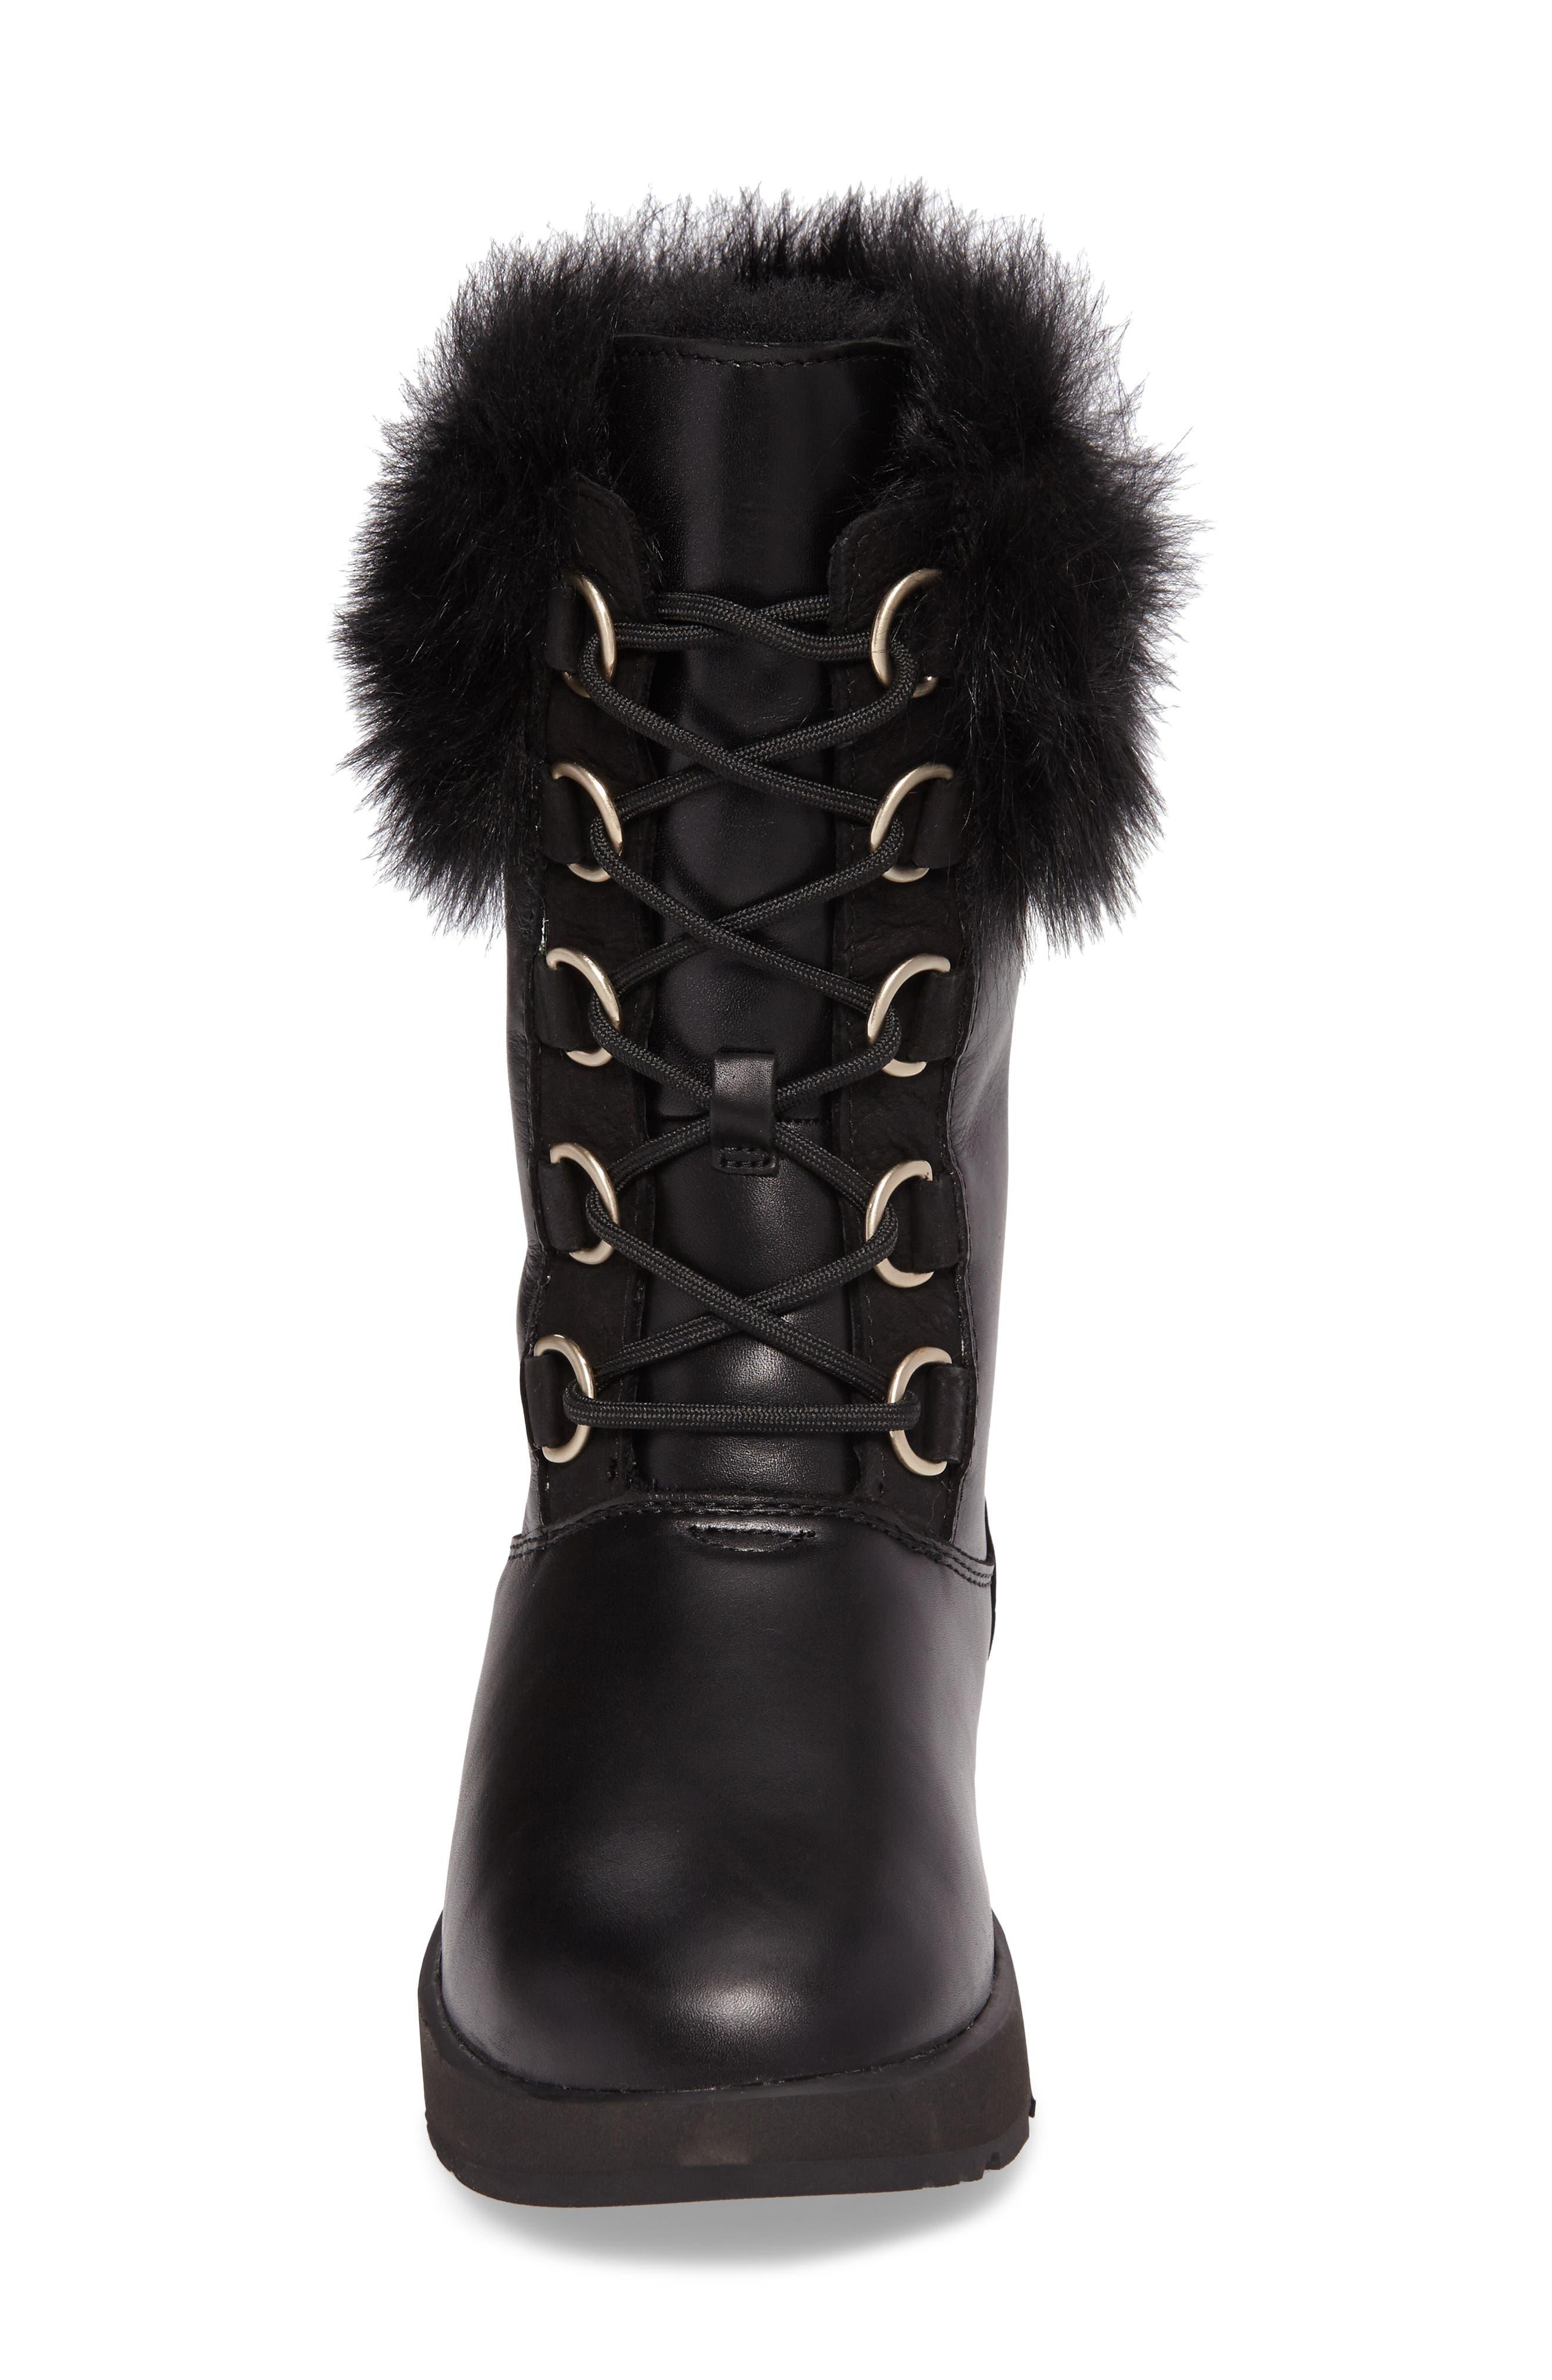 Aya Waterproof Snow Boot,                             Alternate thumbnail 4, color,                             001